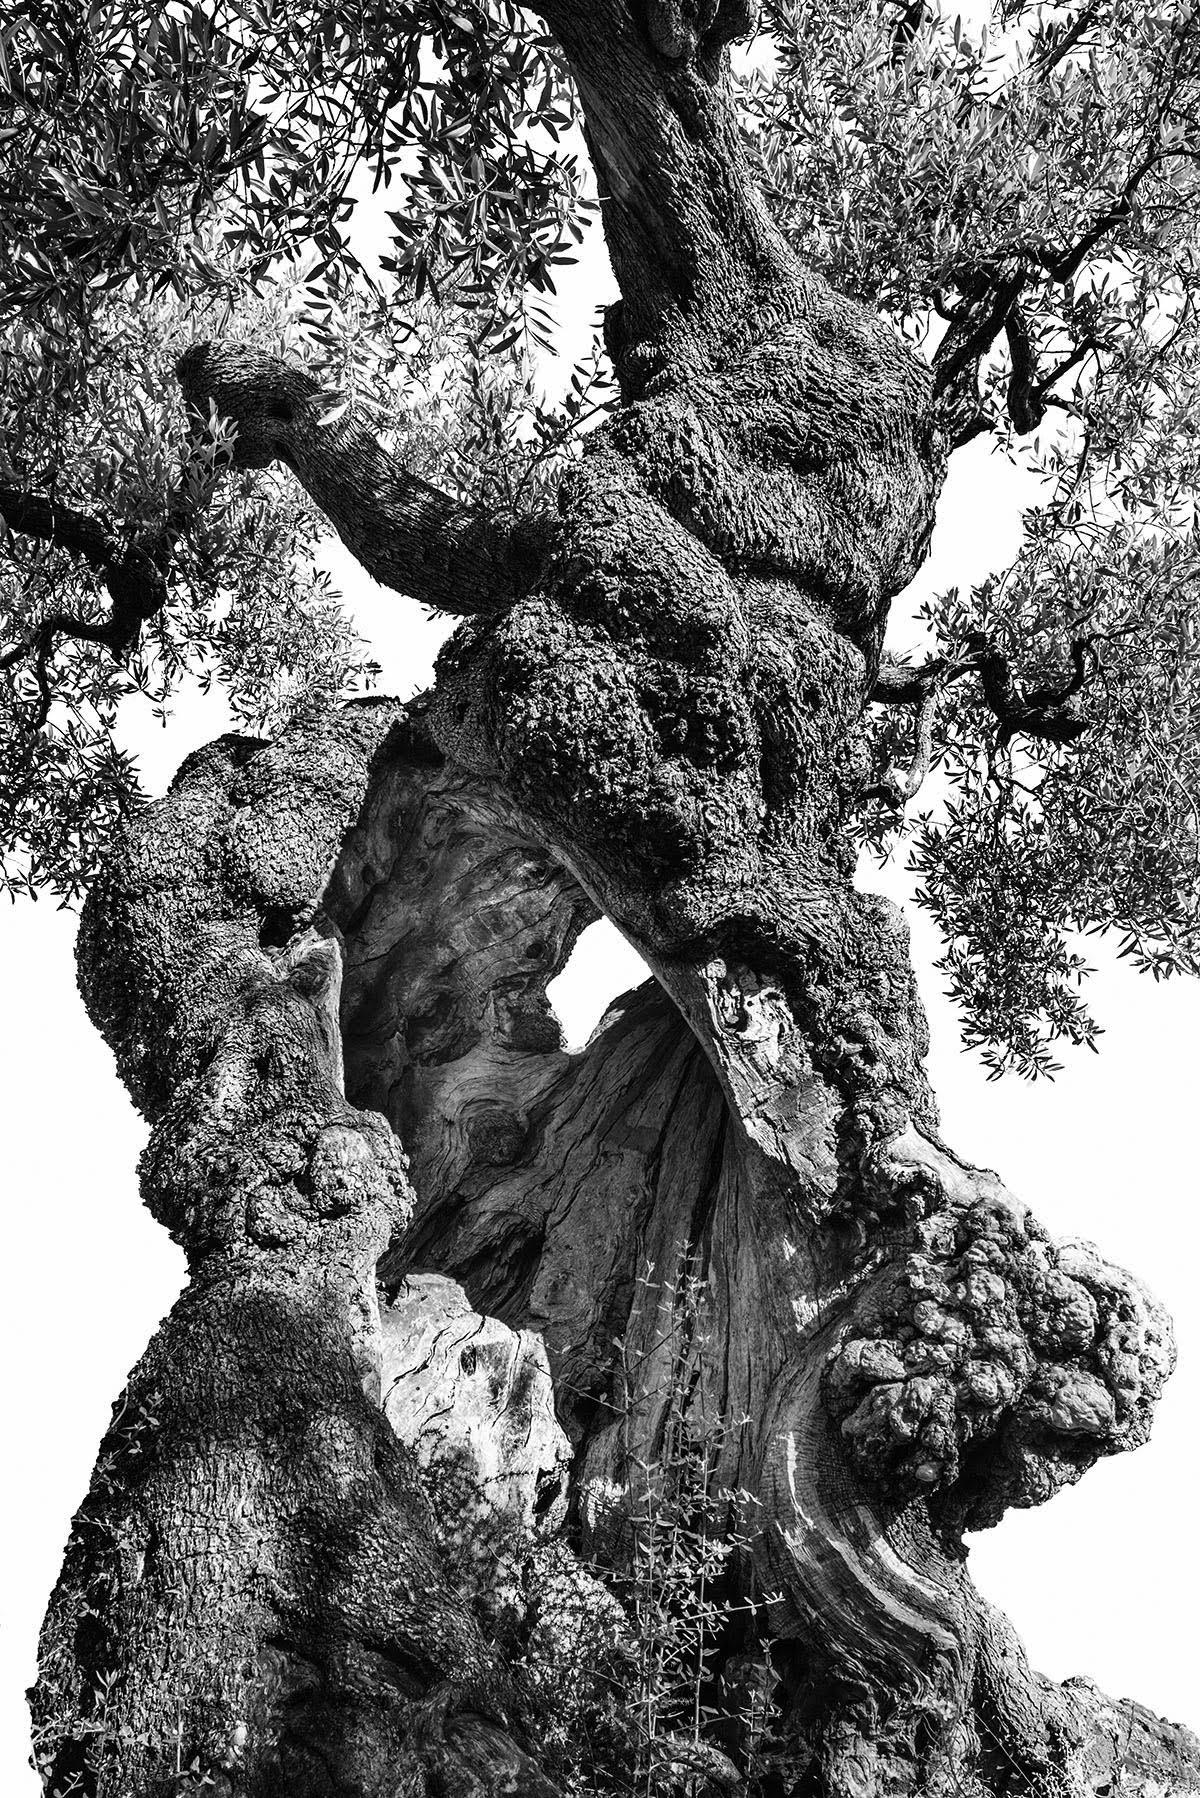 martin-ogolter-Monumentali-nature-landscape-photographer-15